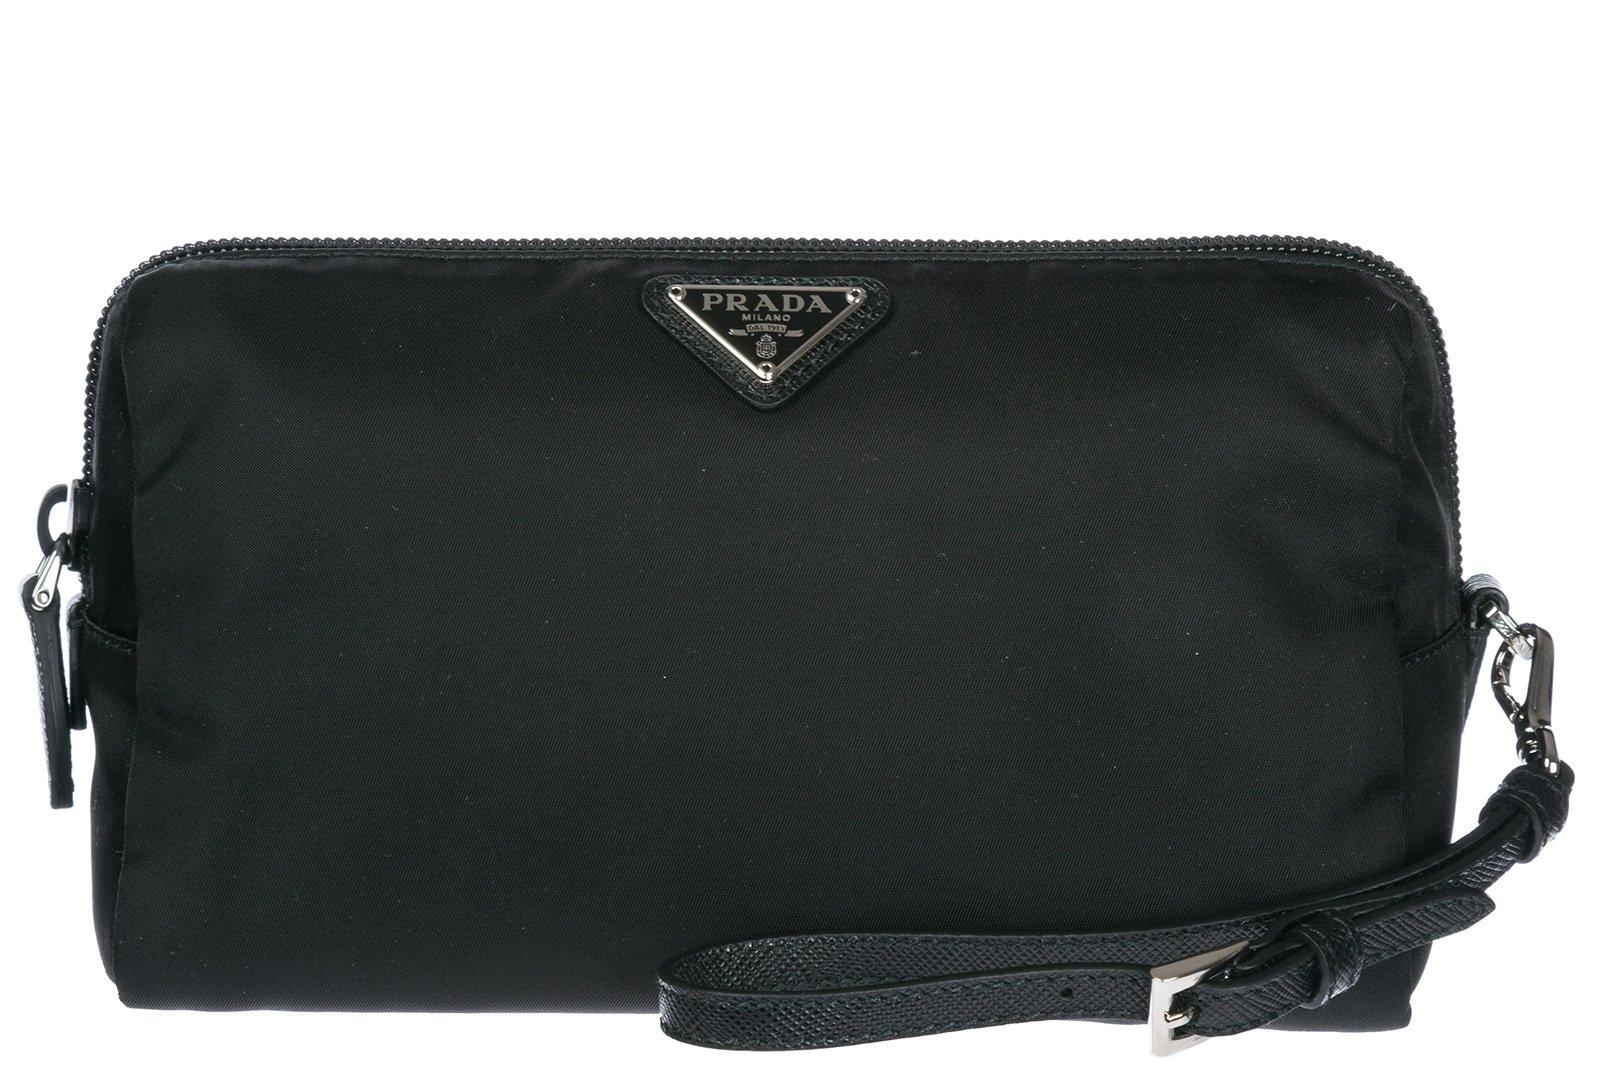 Prada women's travel makeup beauty case in Nylon black